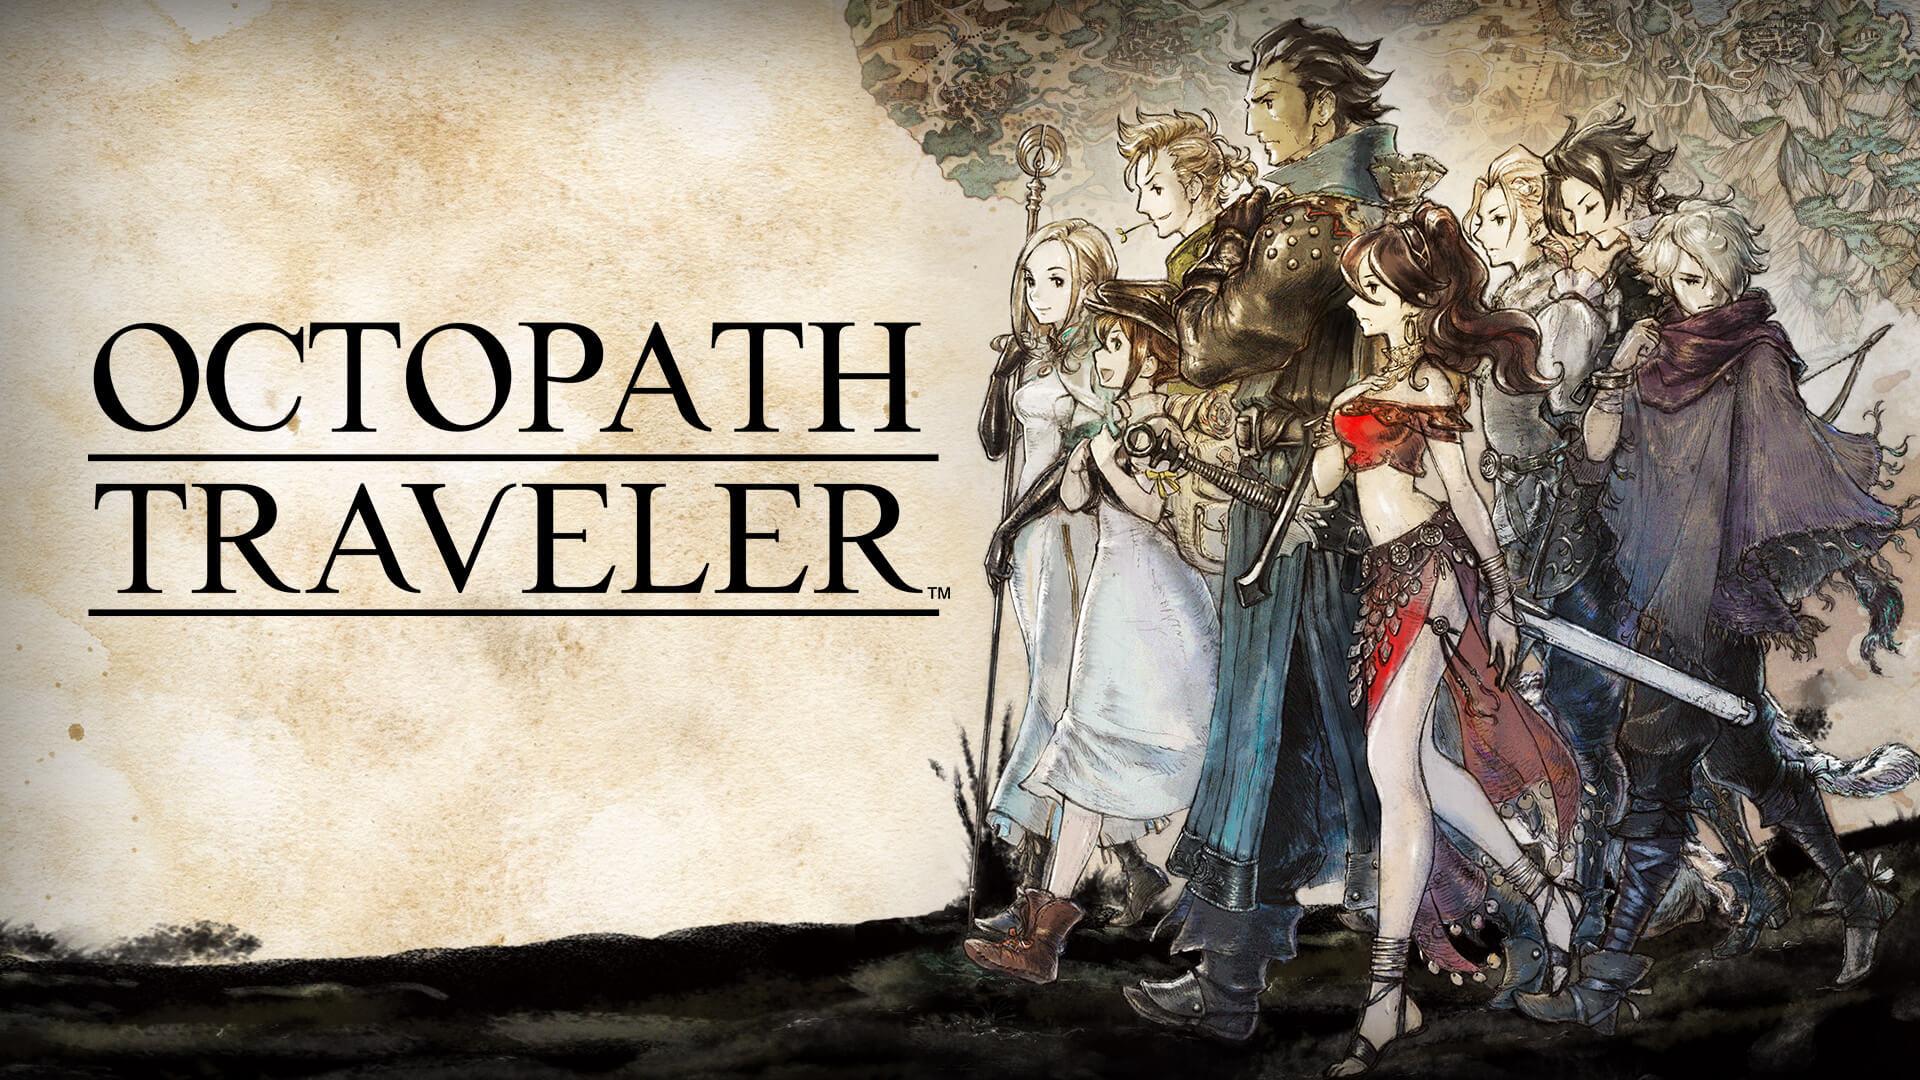 Octopath Traveler Free PC Download